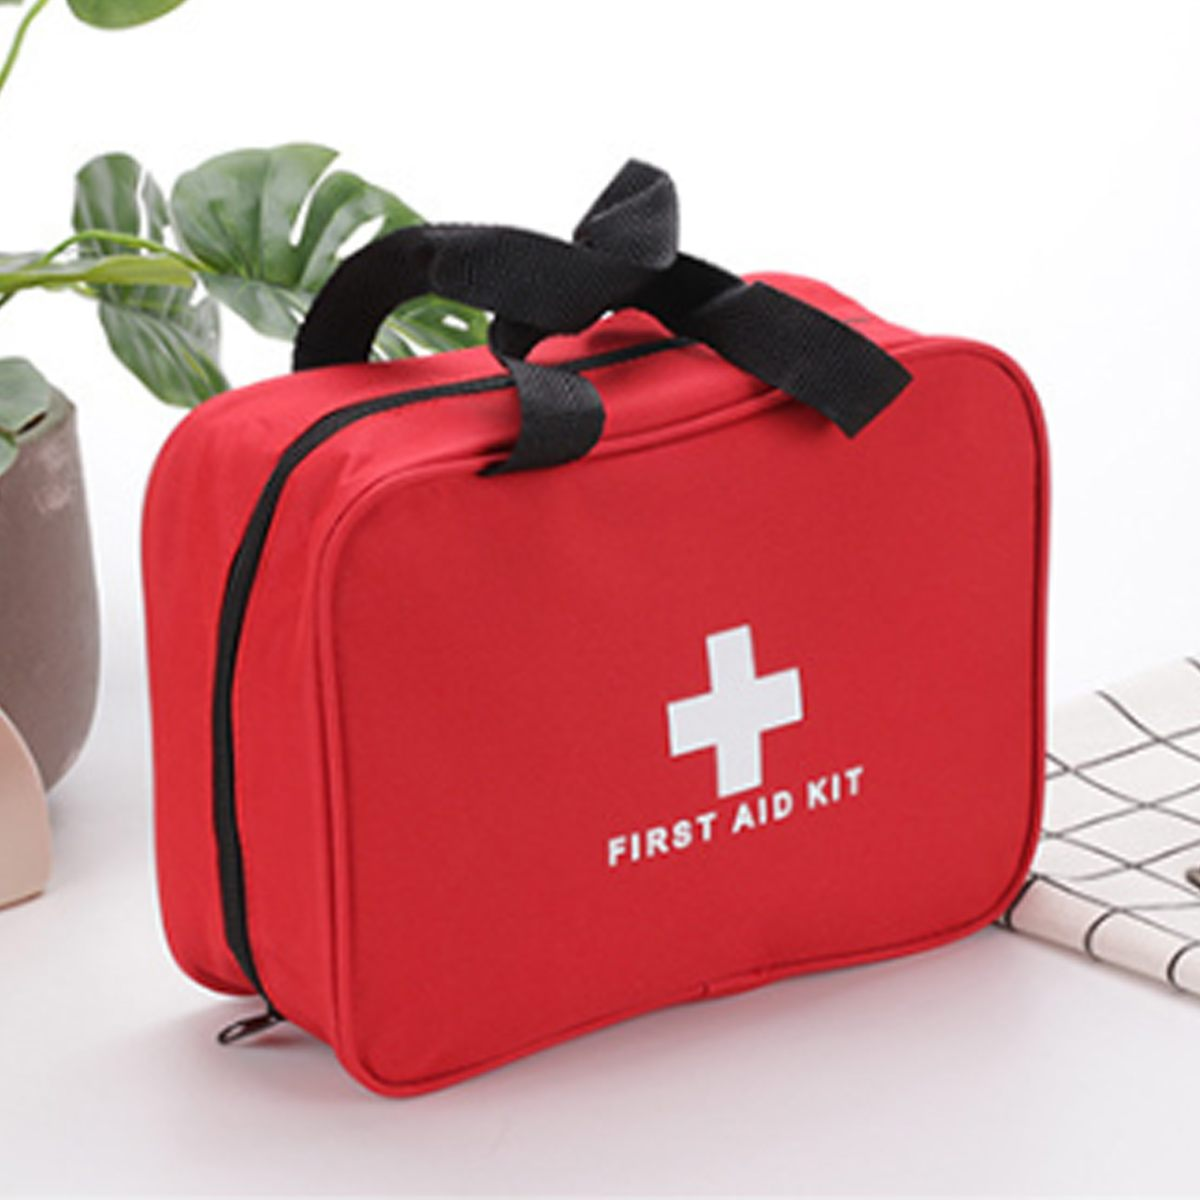 Kit médico de emergencia para primeros auxilios de coche, bolsa de supervivencia, bolsa de almacenamiento vacía para medicina, viaje a casa, deporte al aire libre, Camping